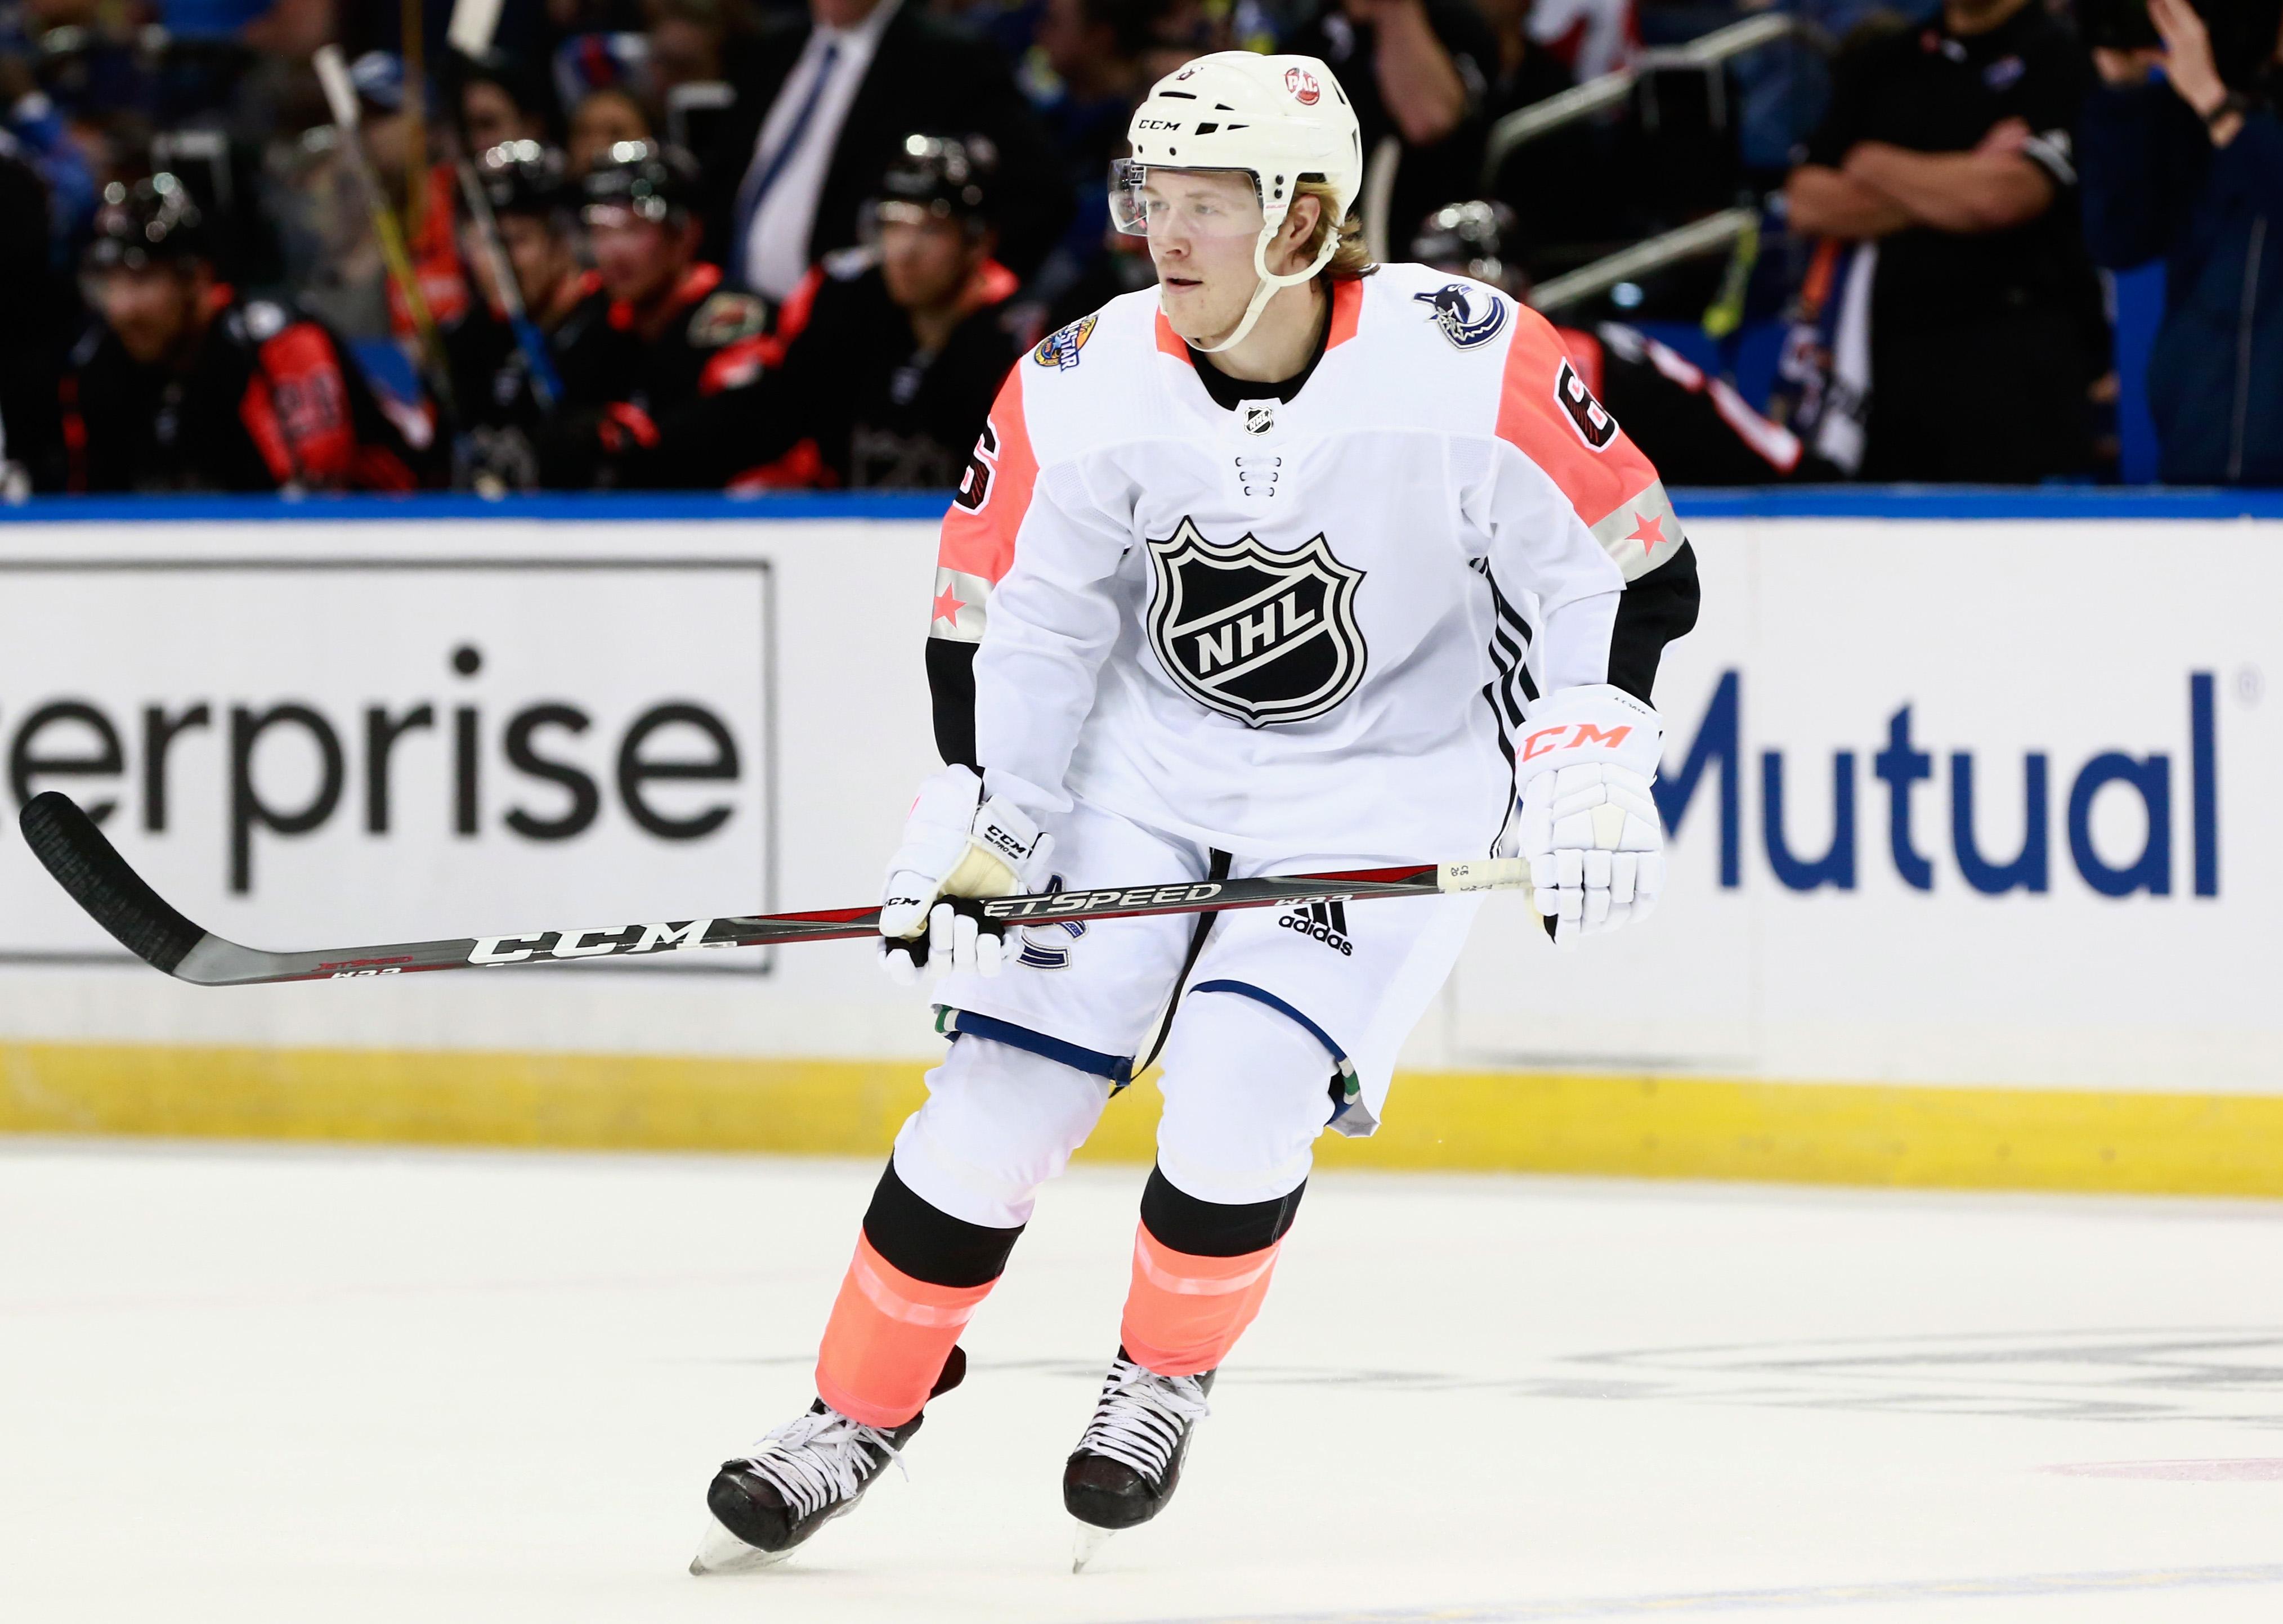 Brock Boeser's NHL All-Star Game MVP windfall includes $337,500 and a car